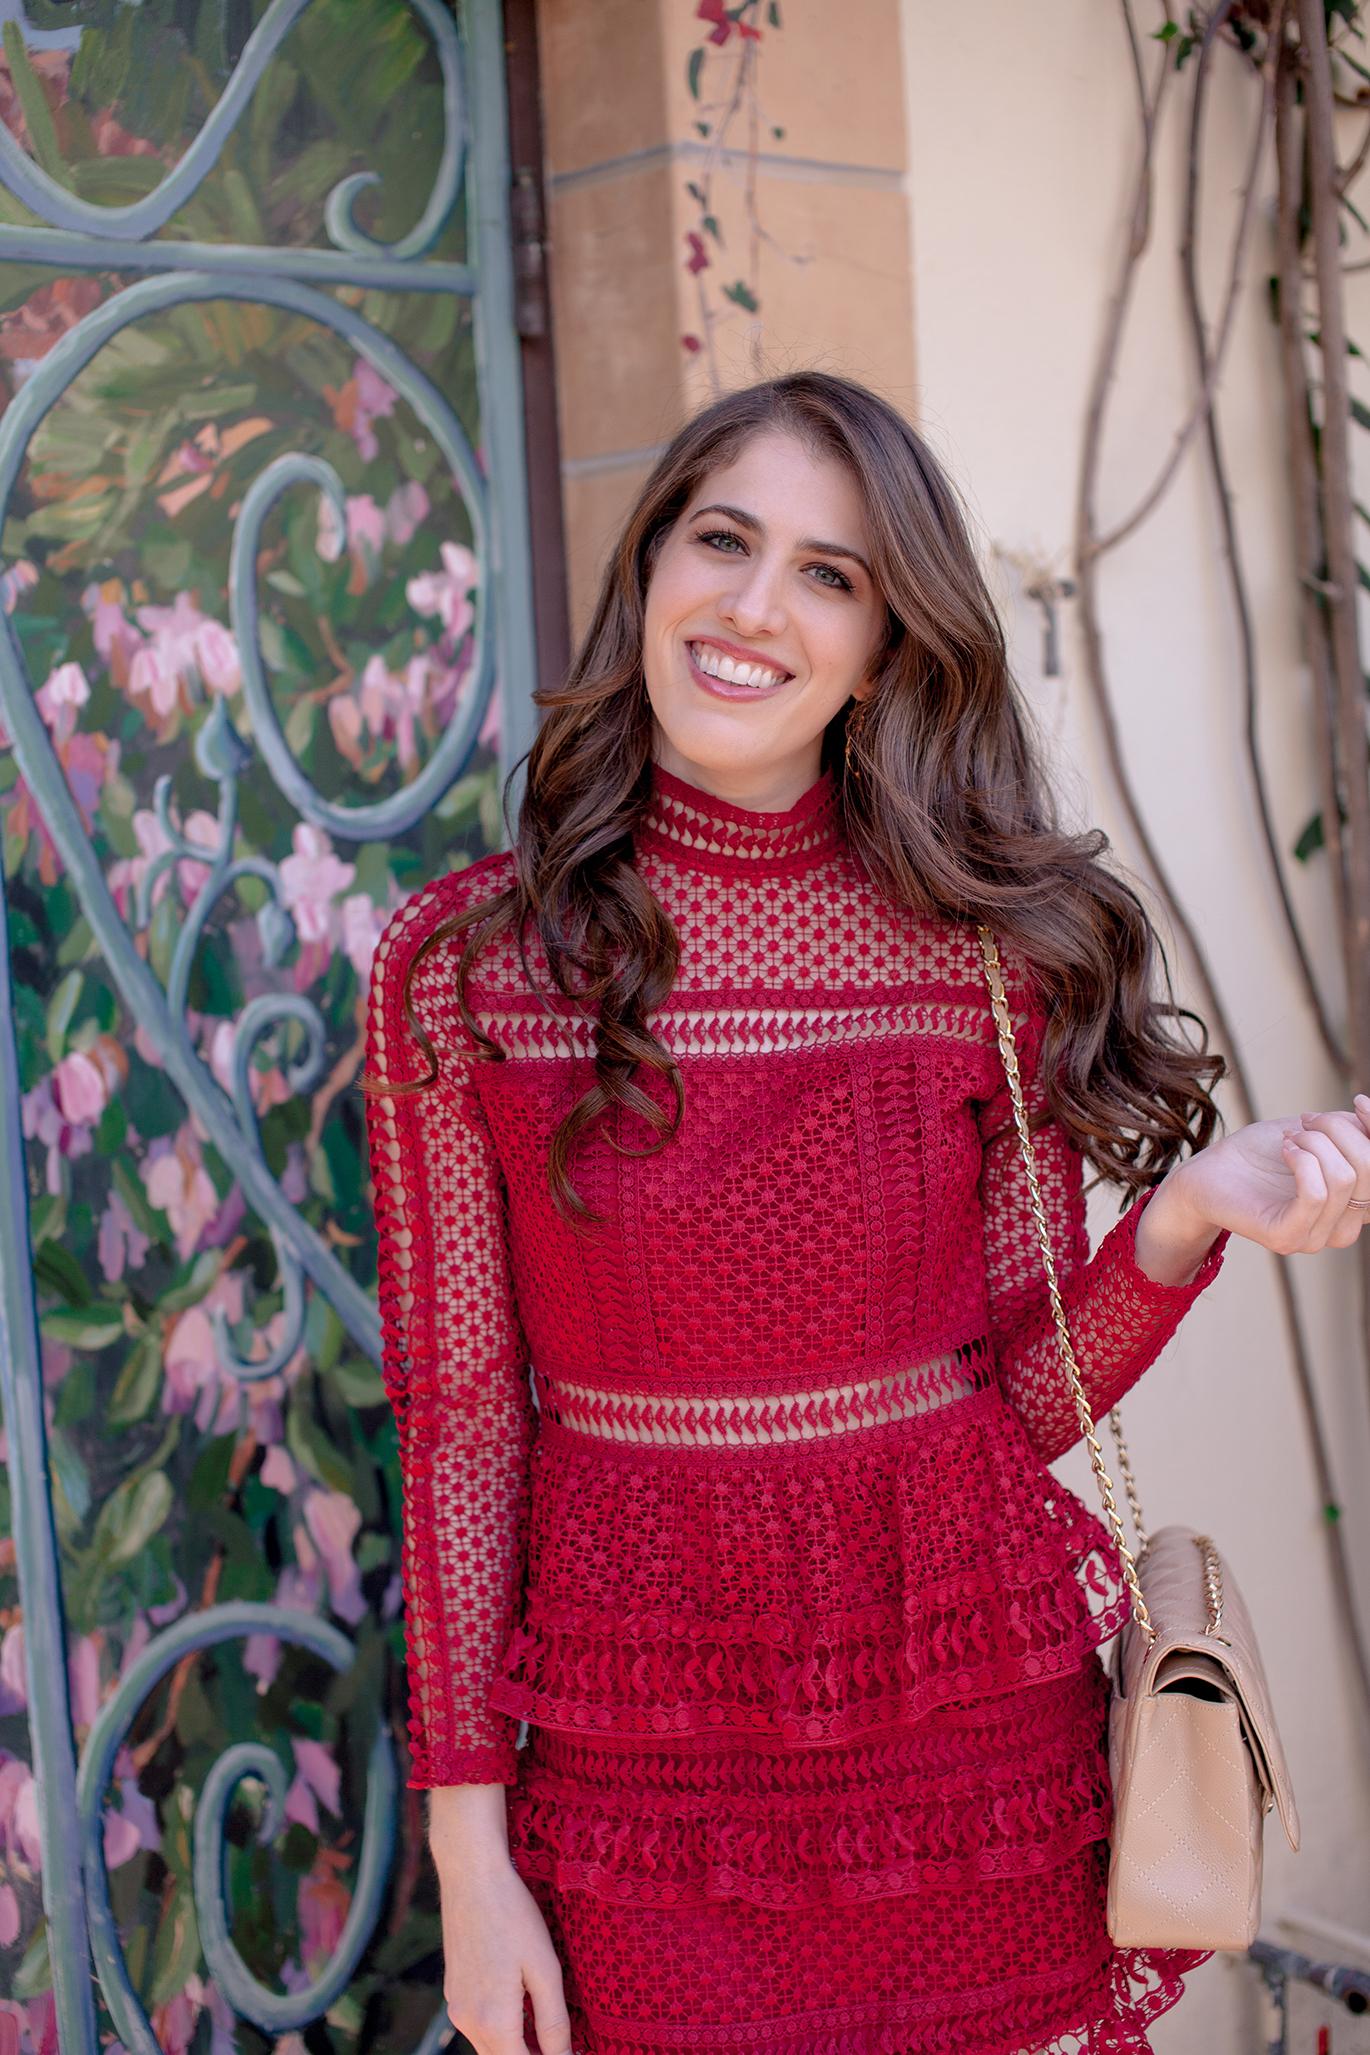 Los Angeles fashion blog Brooke du jour